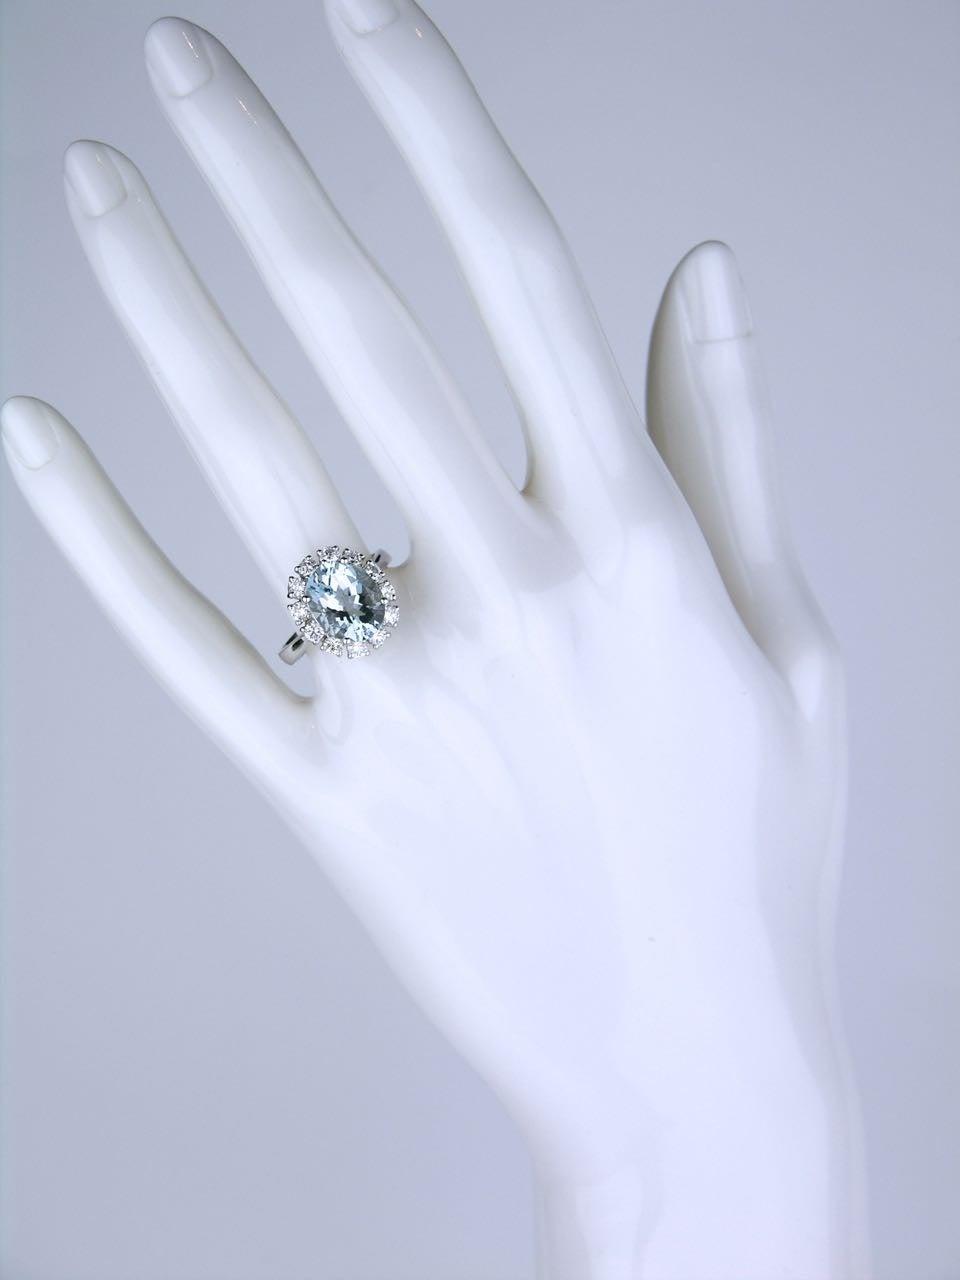 American oval aquamarine diamond Gold cluster ring 6